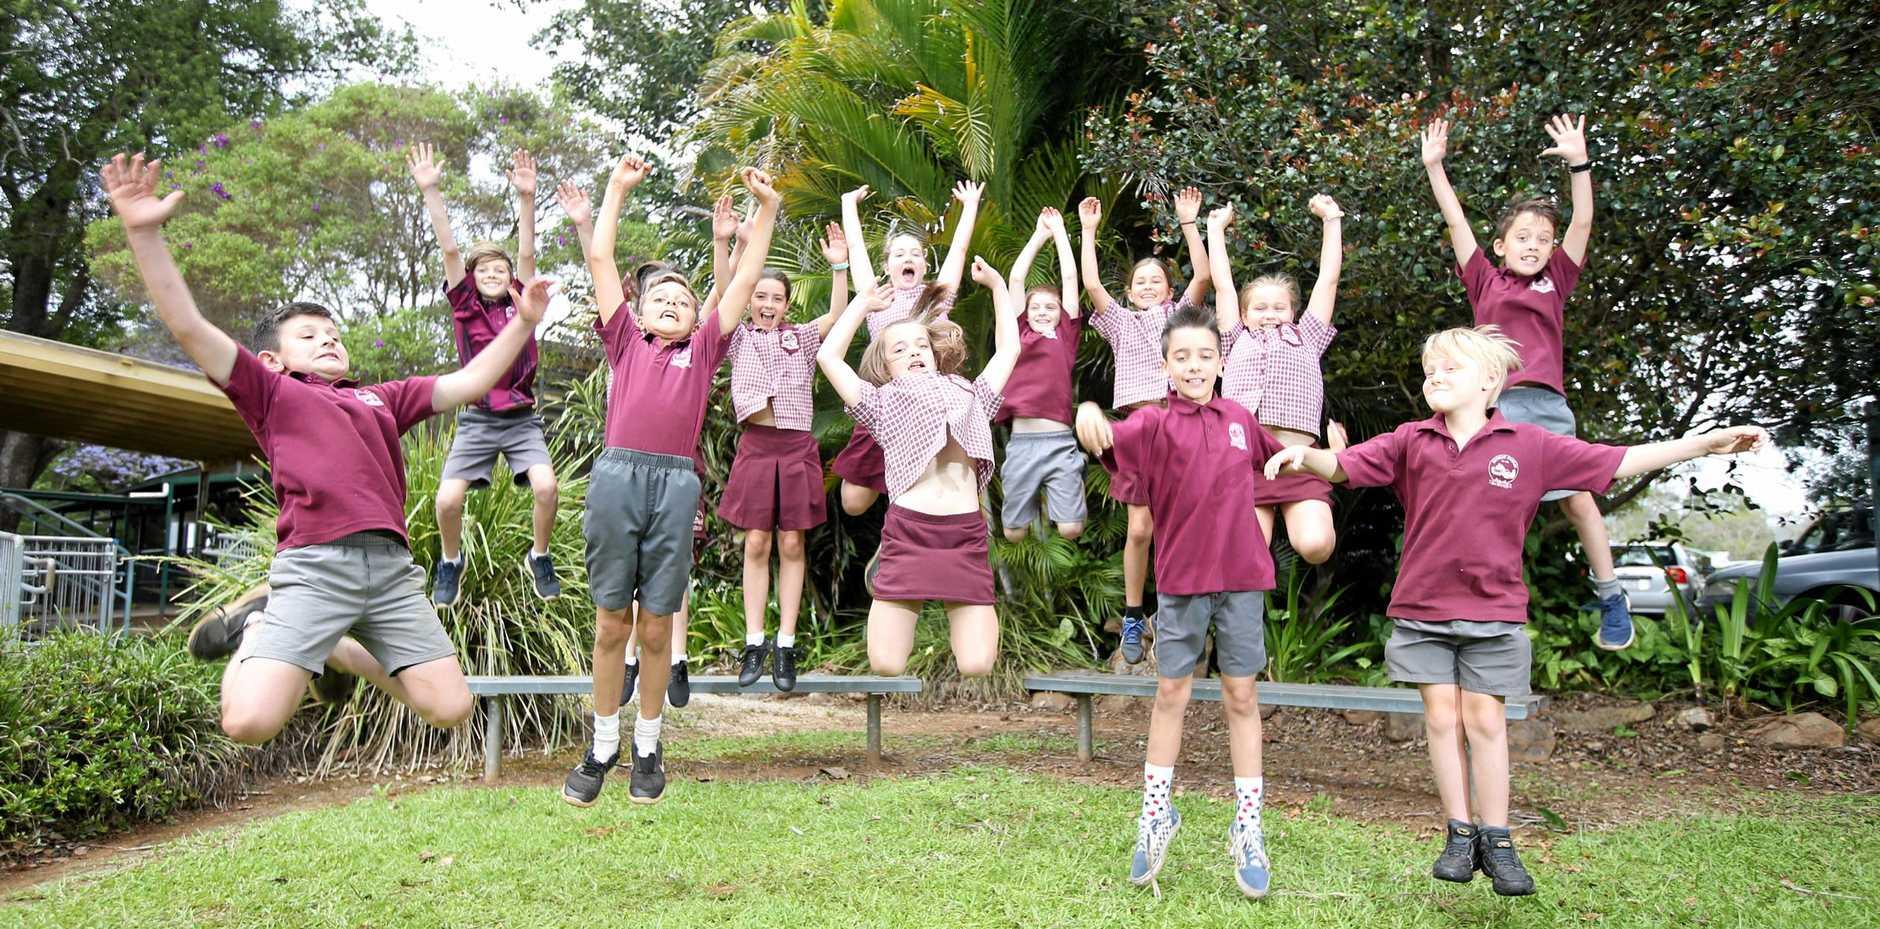 Dungay Public School is turning 125 on Saturday